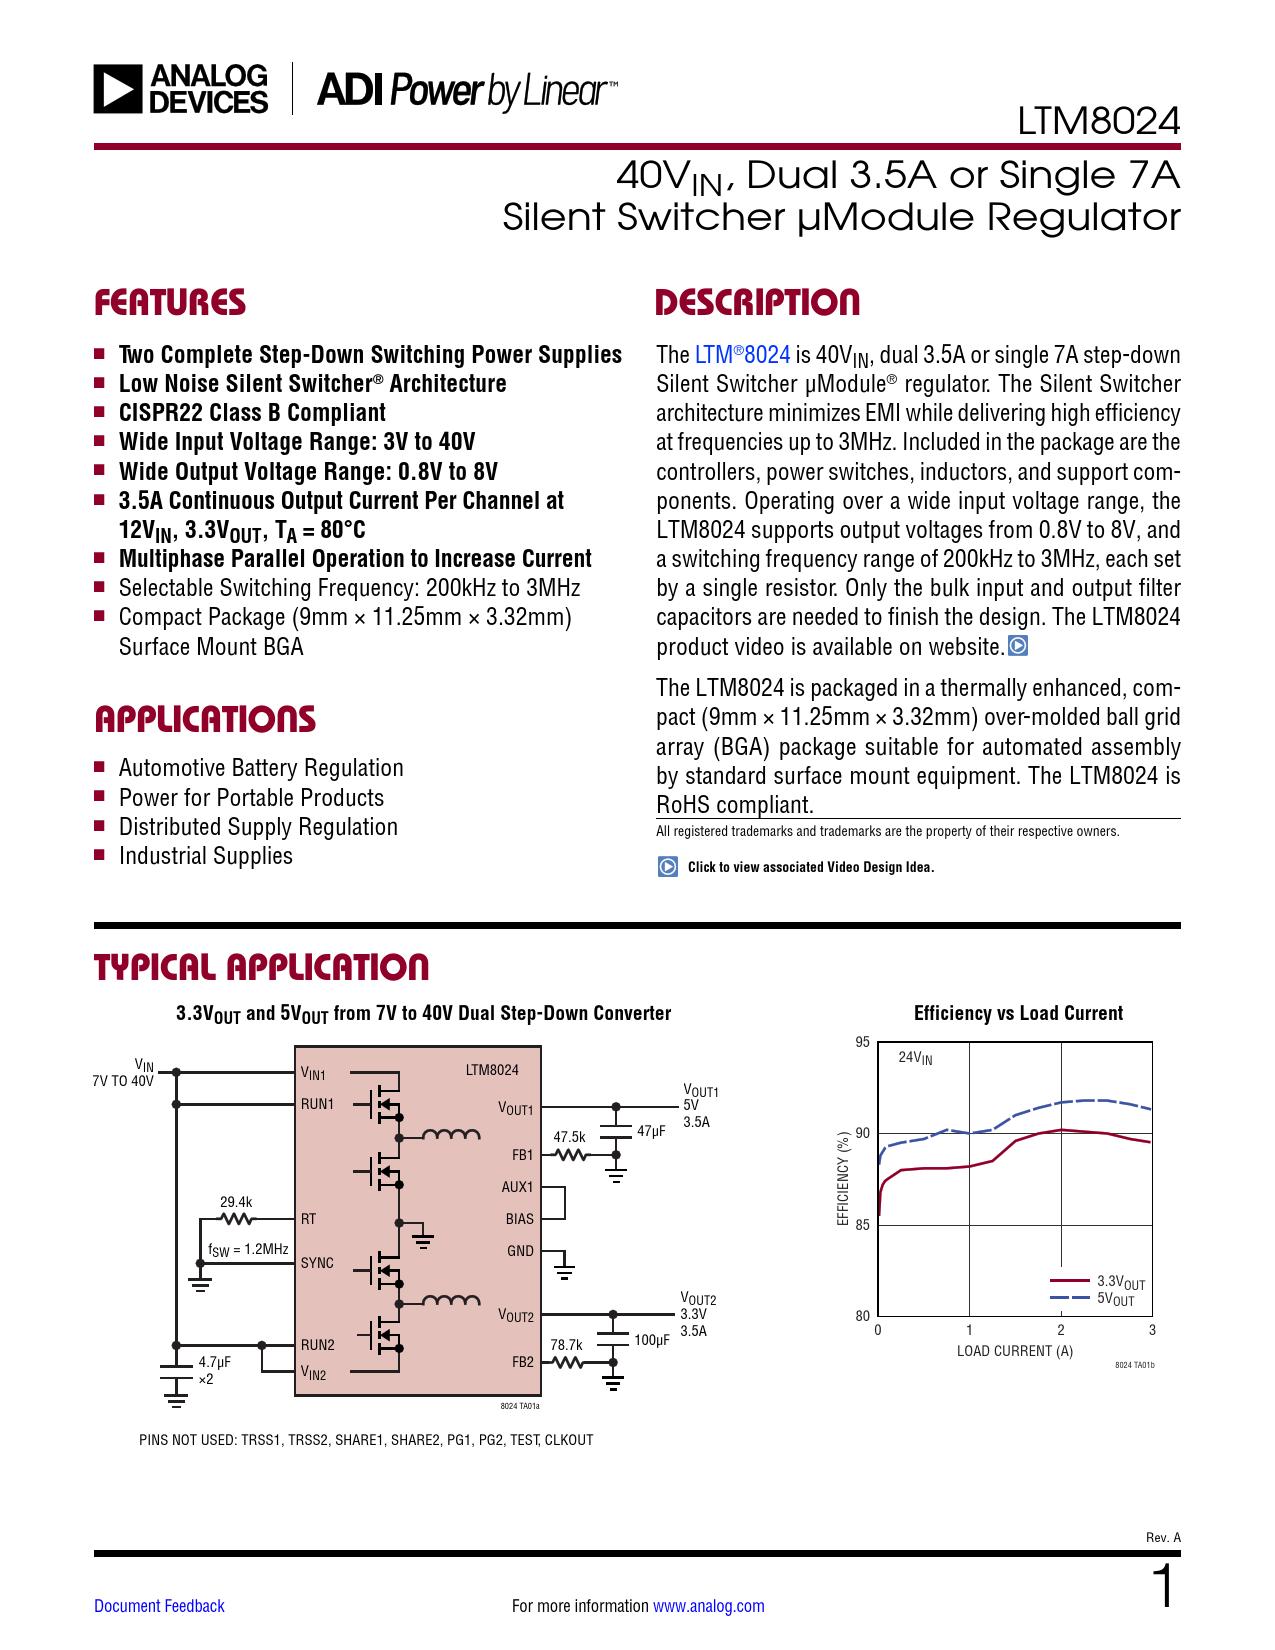 Datasheet LTM8024 Analog Devices, Версия: A